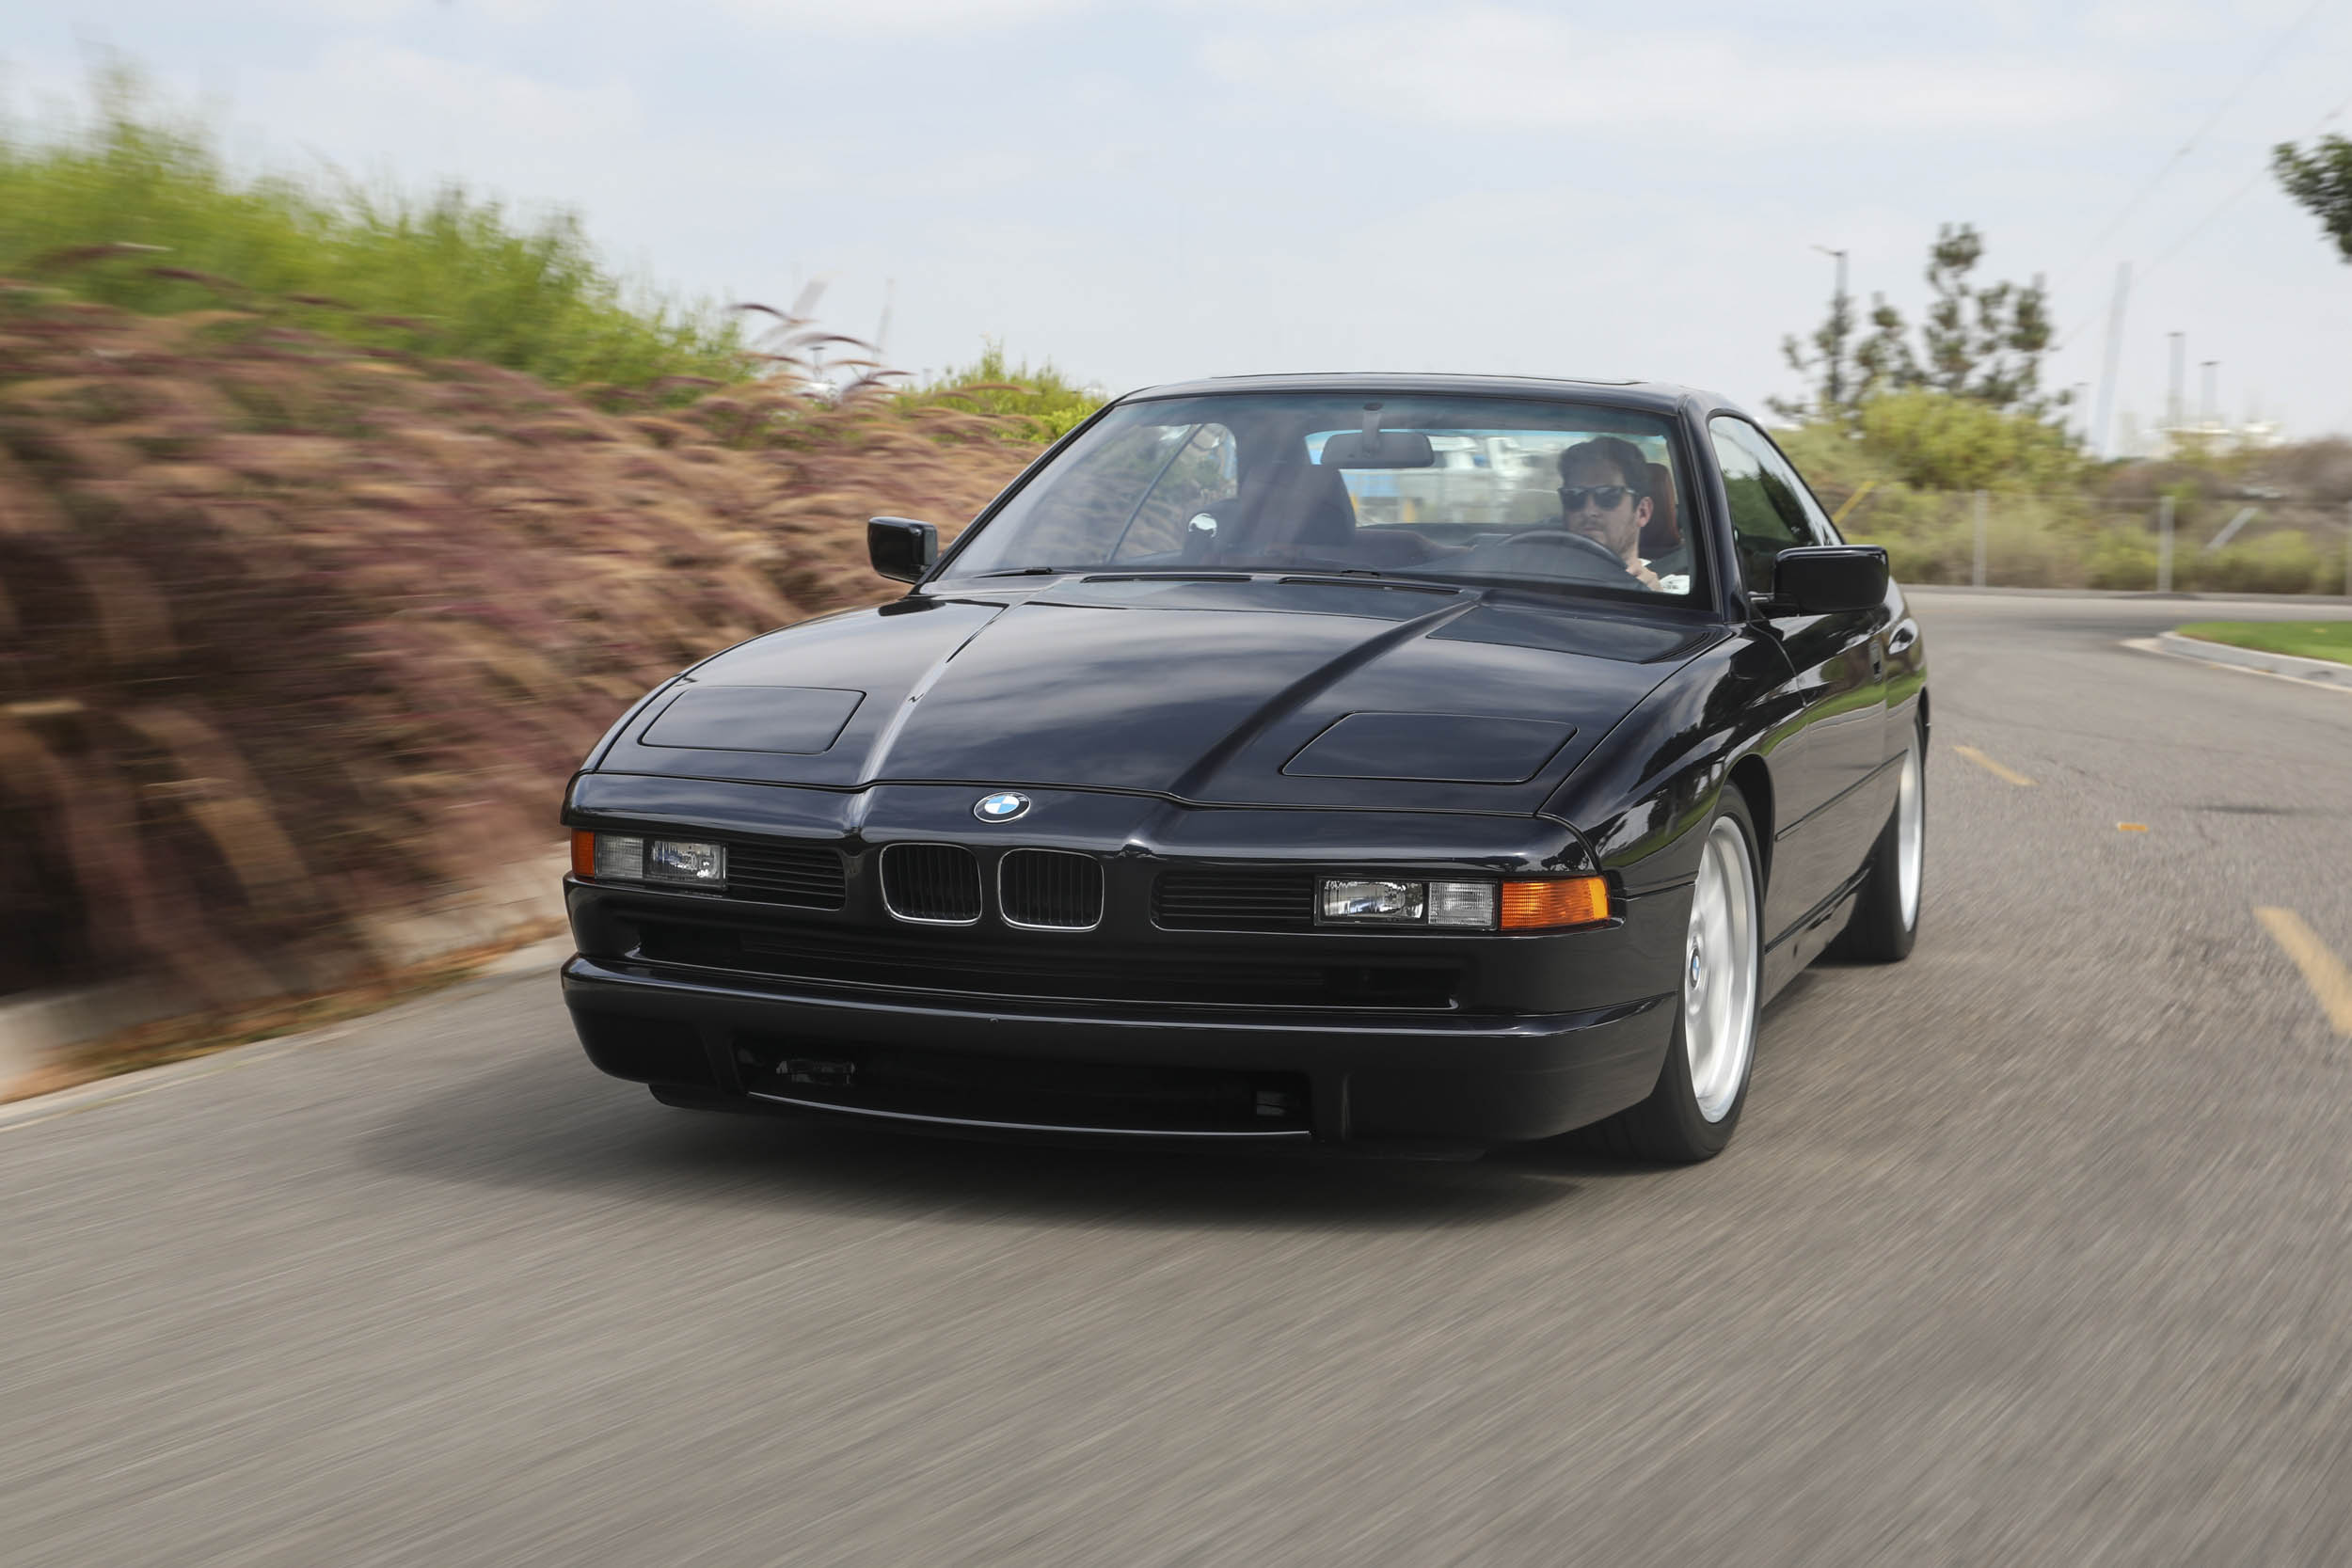 1993 BMW 850Ci driving